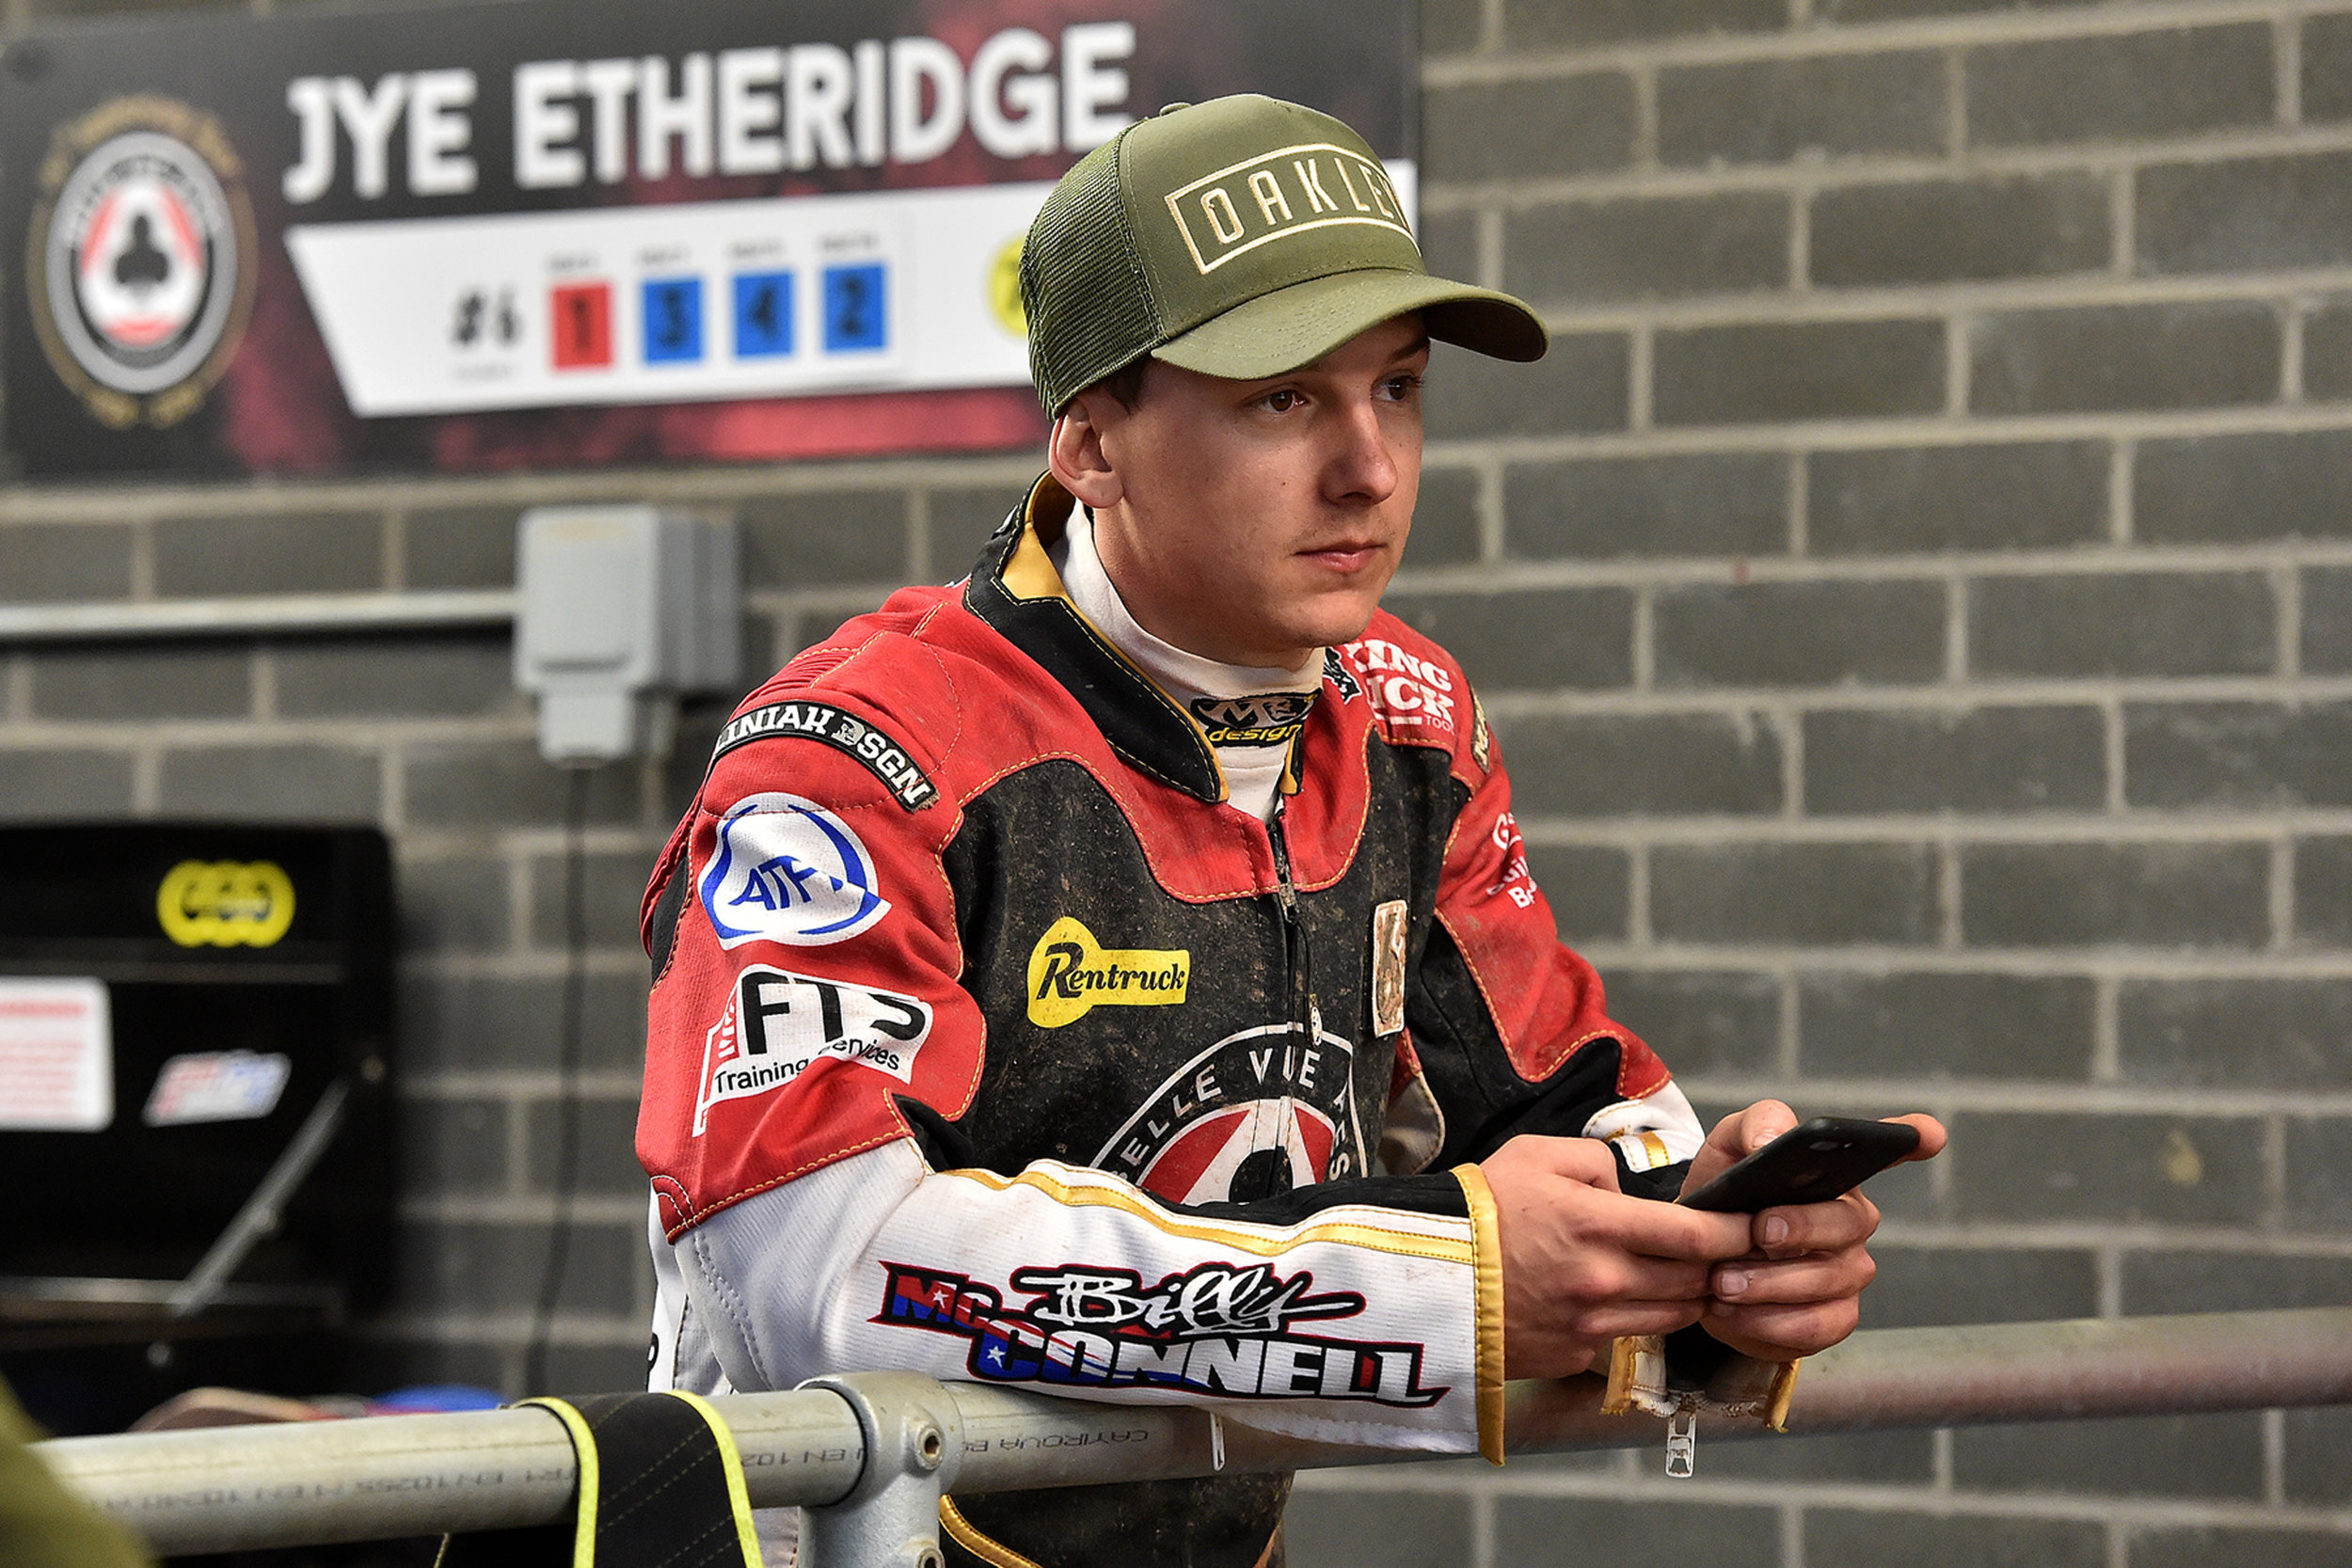 Ex-Belle Vue Ace Jye Etheridge will stand in for Nikolaj Busk Jakobsen